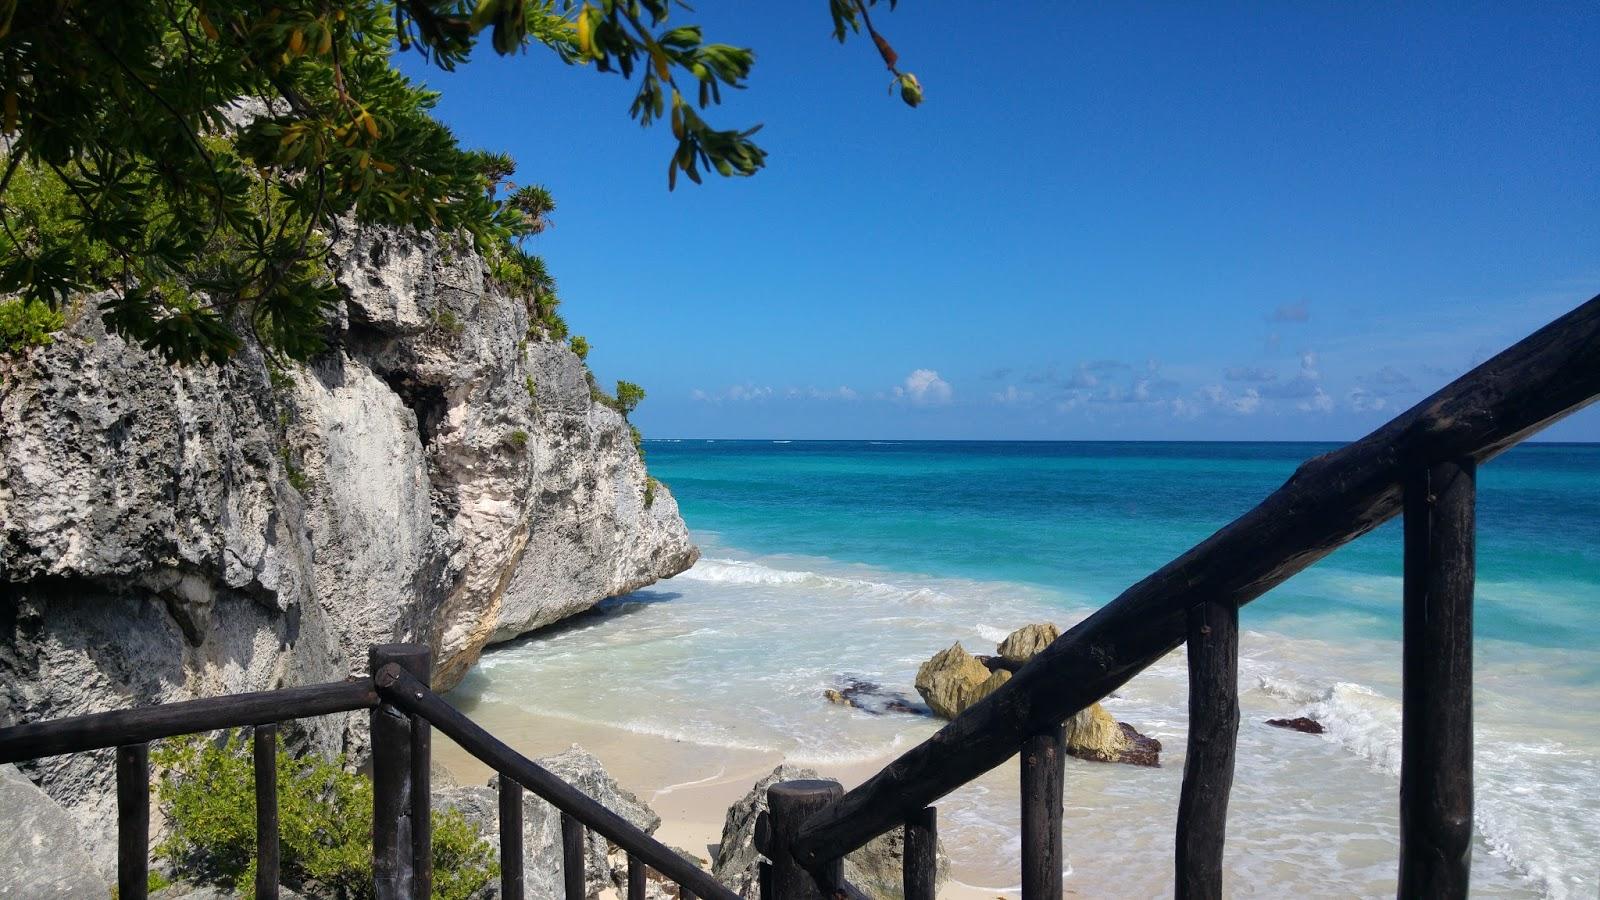 bahamas, cayman islands, chichén itzá, costa maya, cozumel, dunn's river falls, jamaika, karibik, kreuzfahrt, maya ruinen, mexiko, miami, msc divina, reisebericht, royal caribbean, travel blogger, tulum, urlaub,